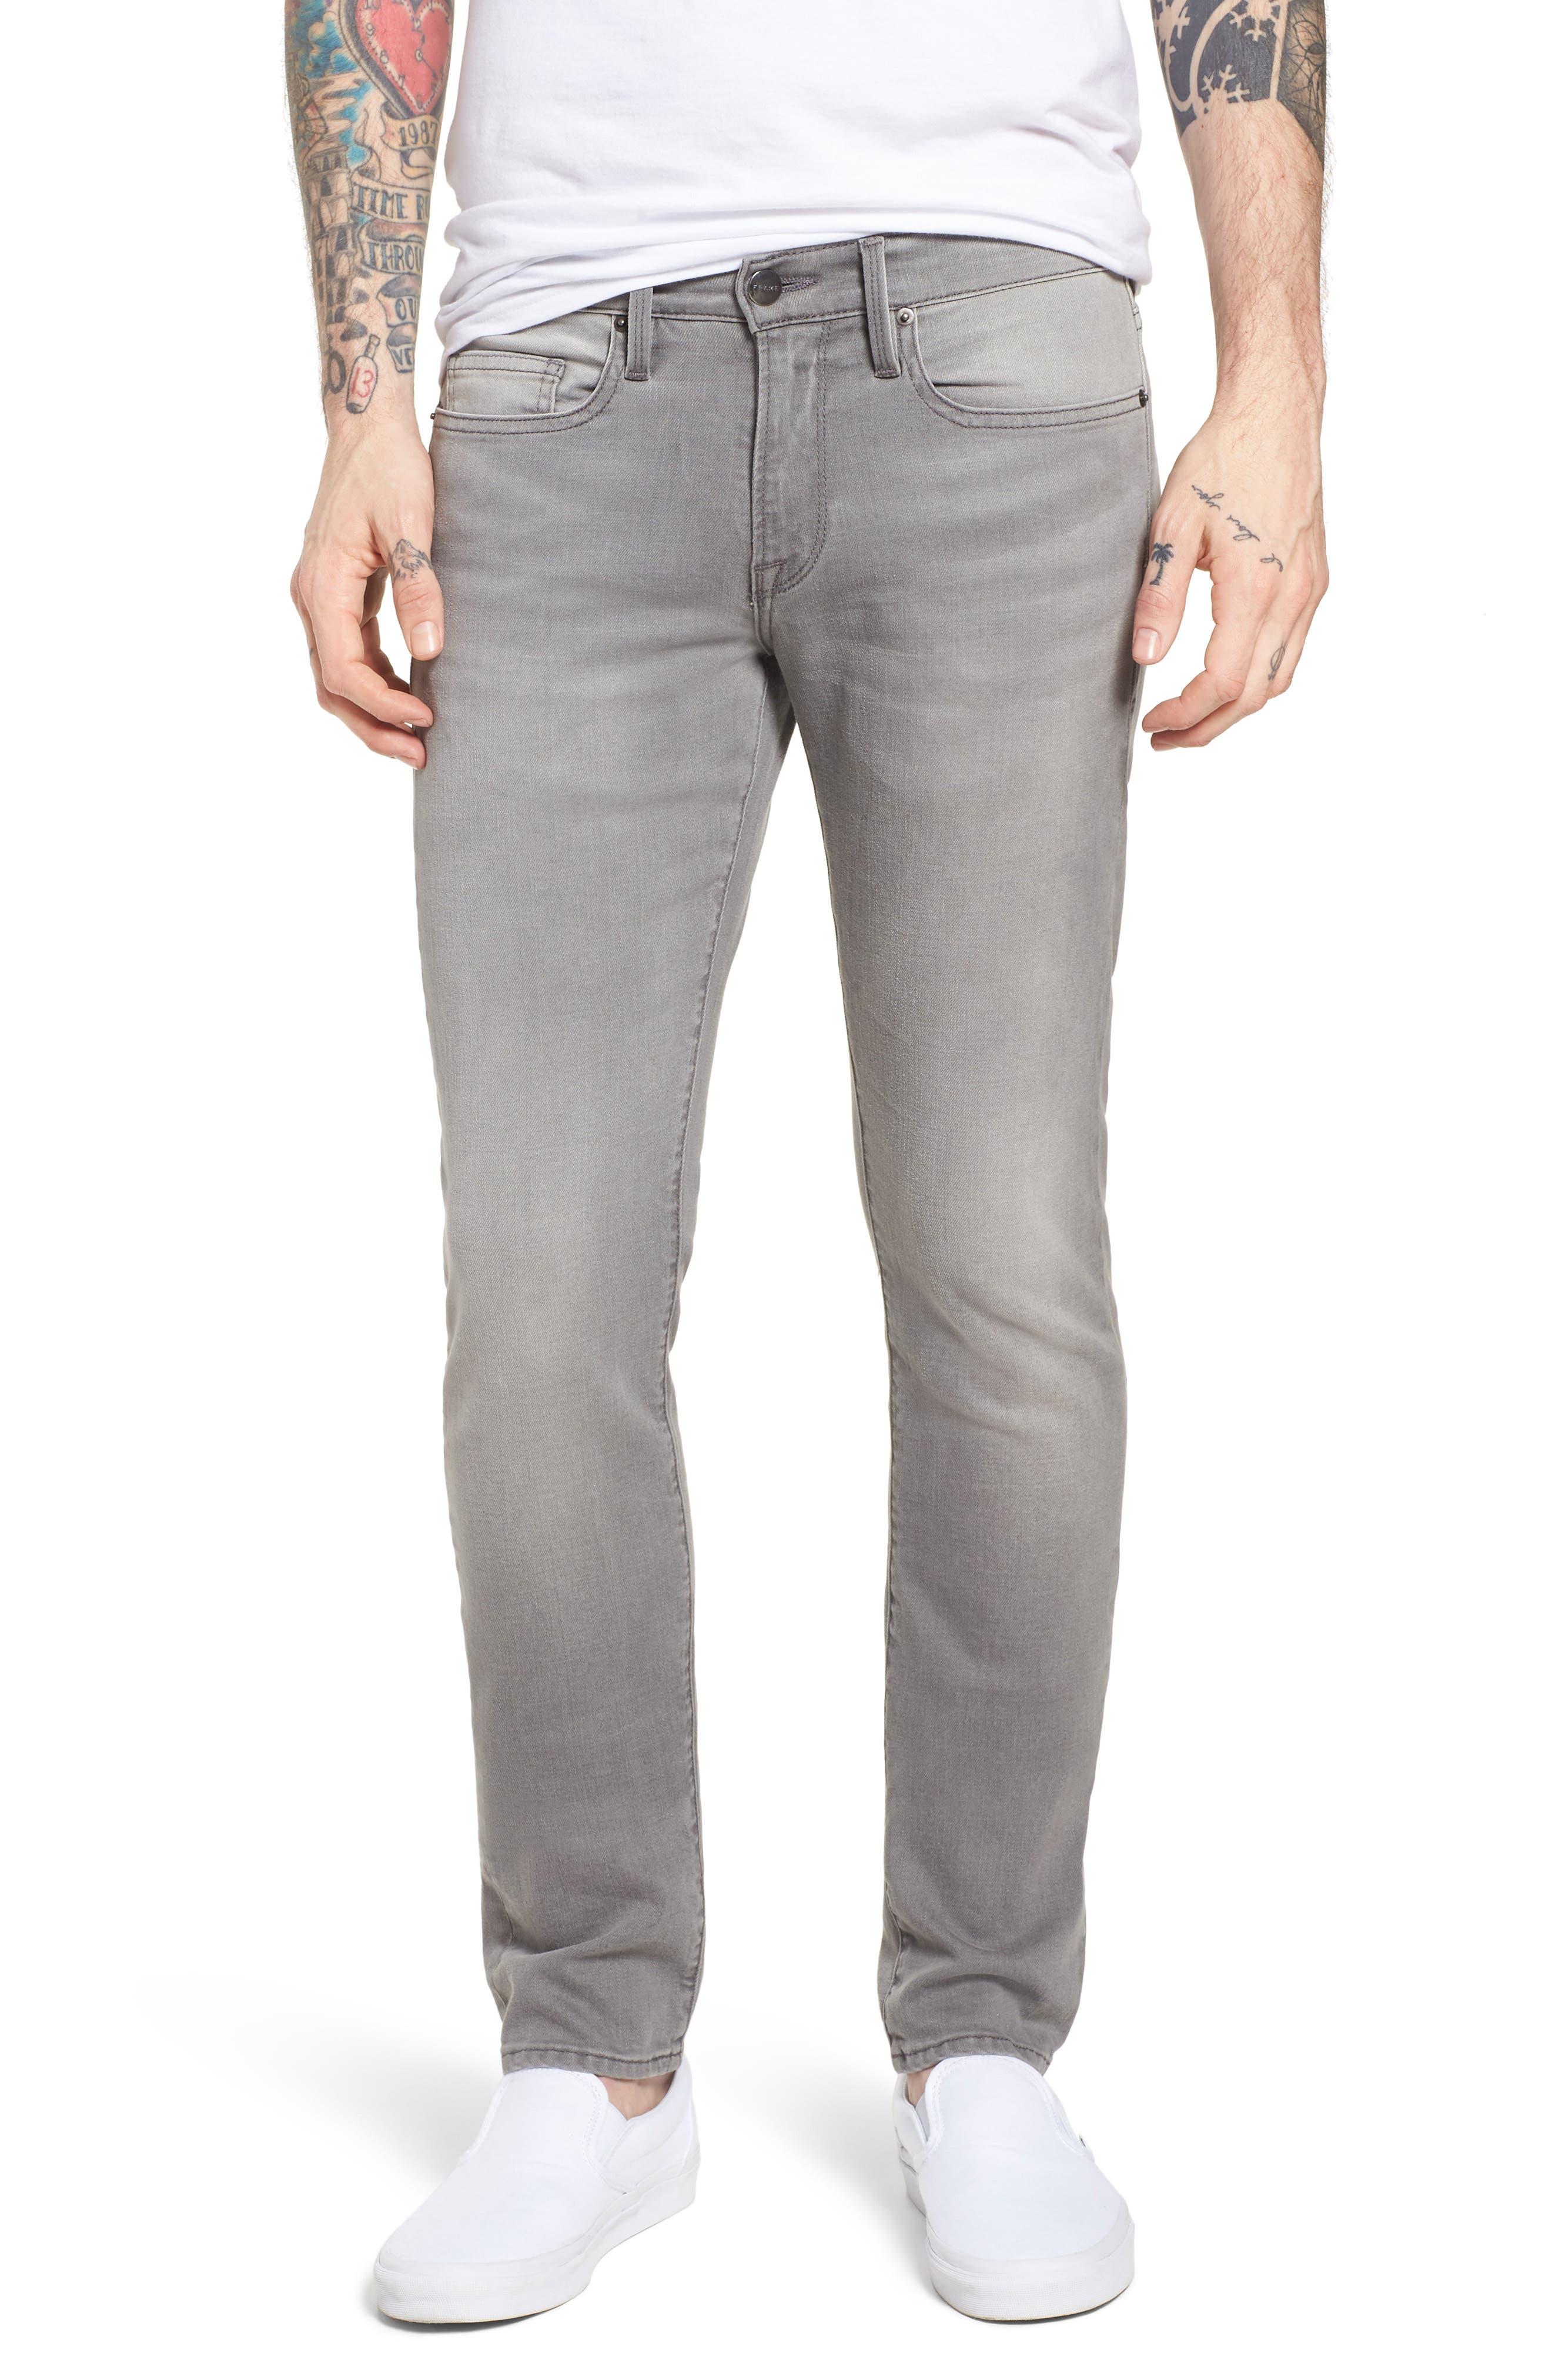 L'Homme Slim Fit Jeans,                         Main,                         color, Bedwell